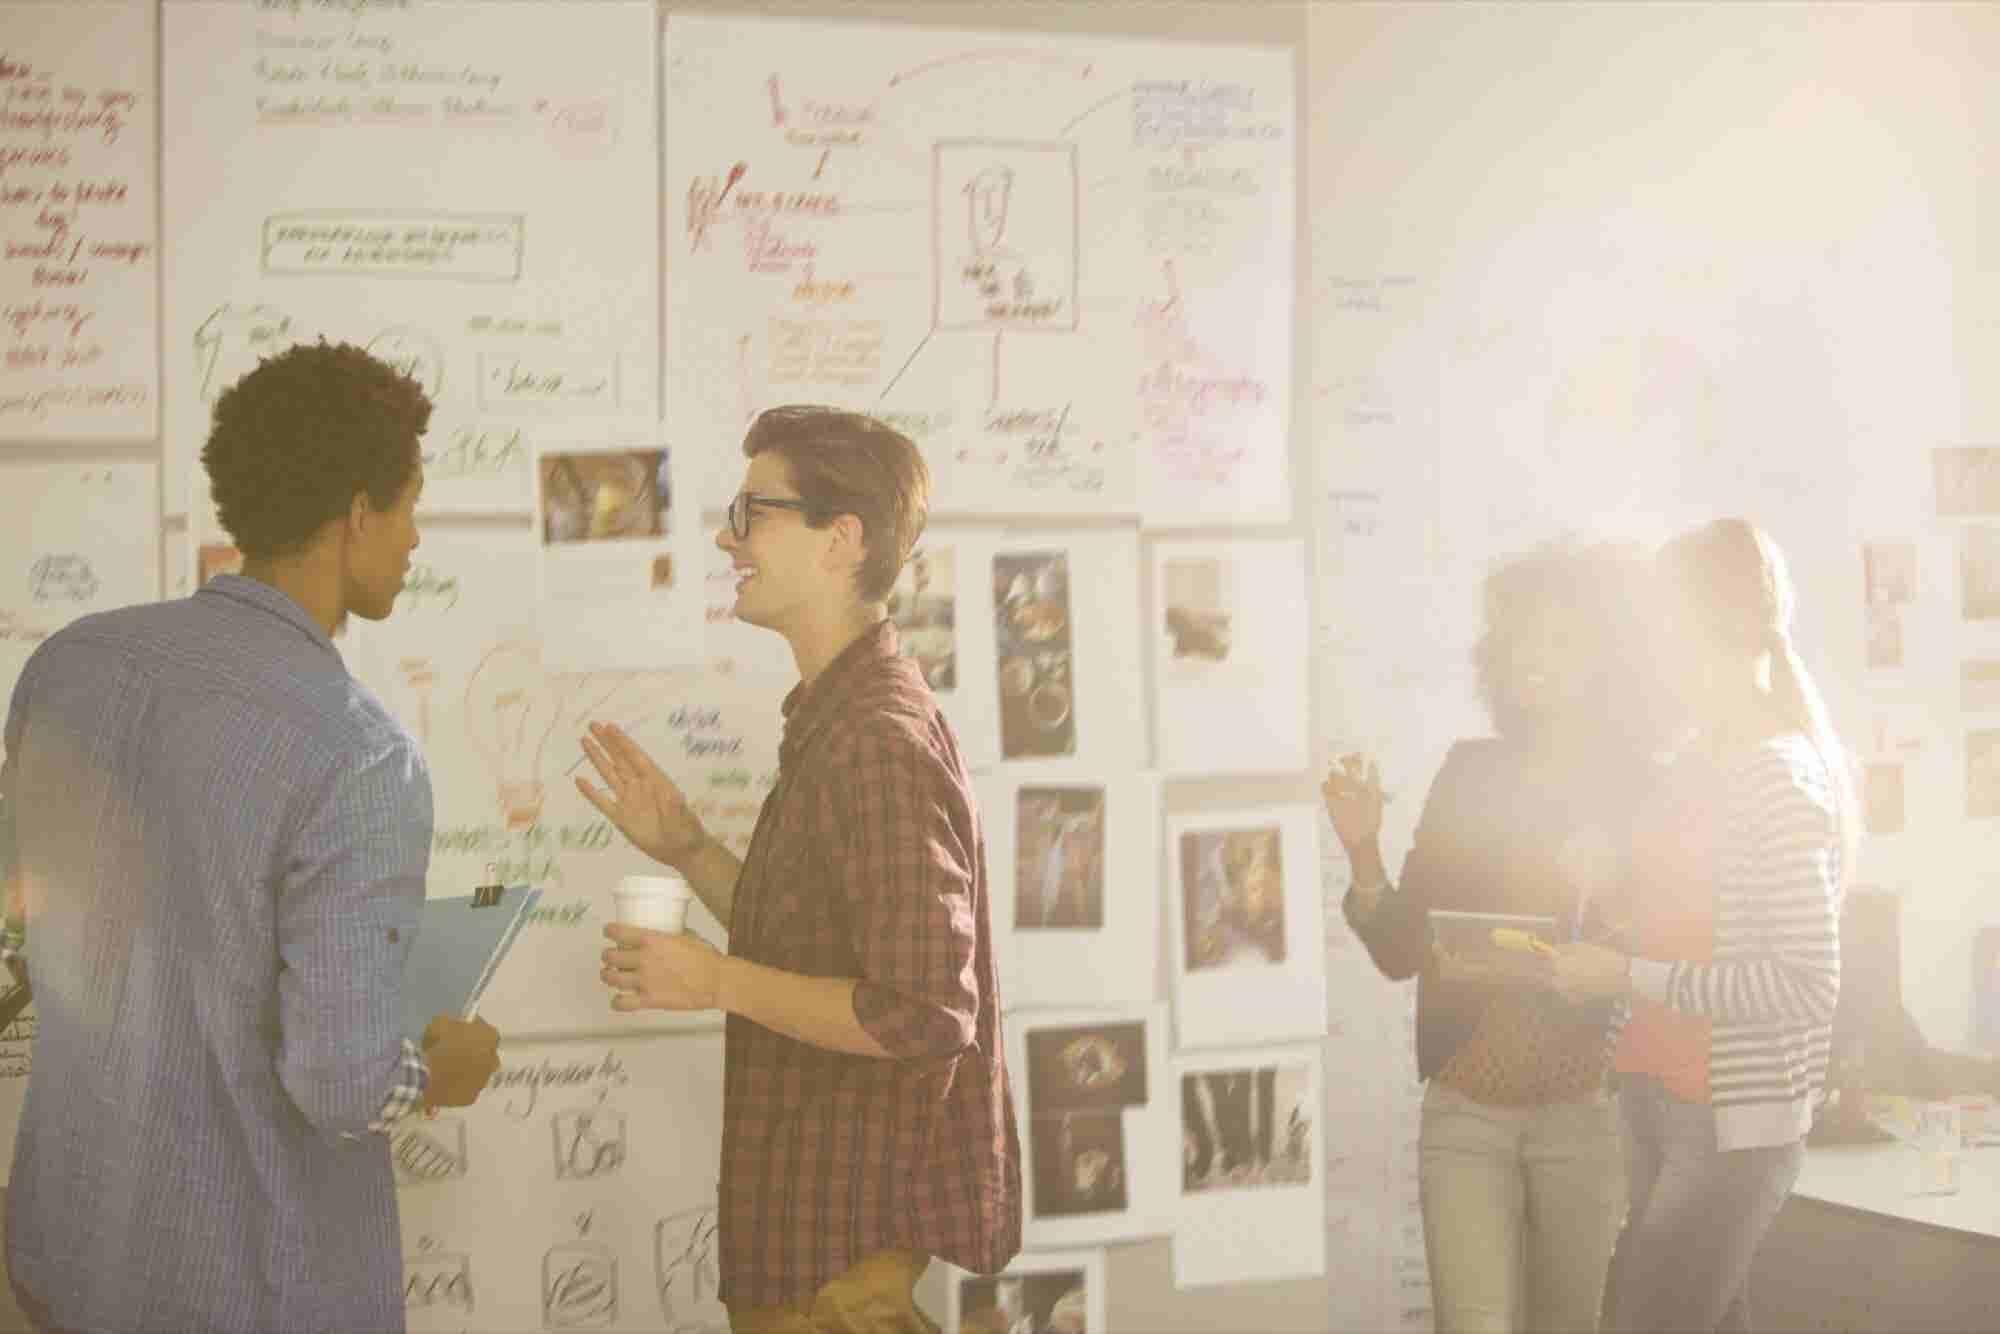 5 Ways to Innovate 21st Century Business